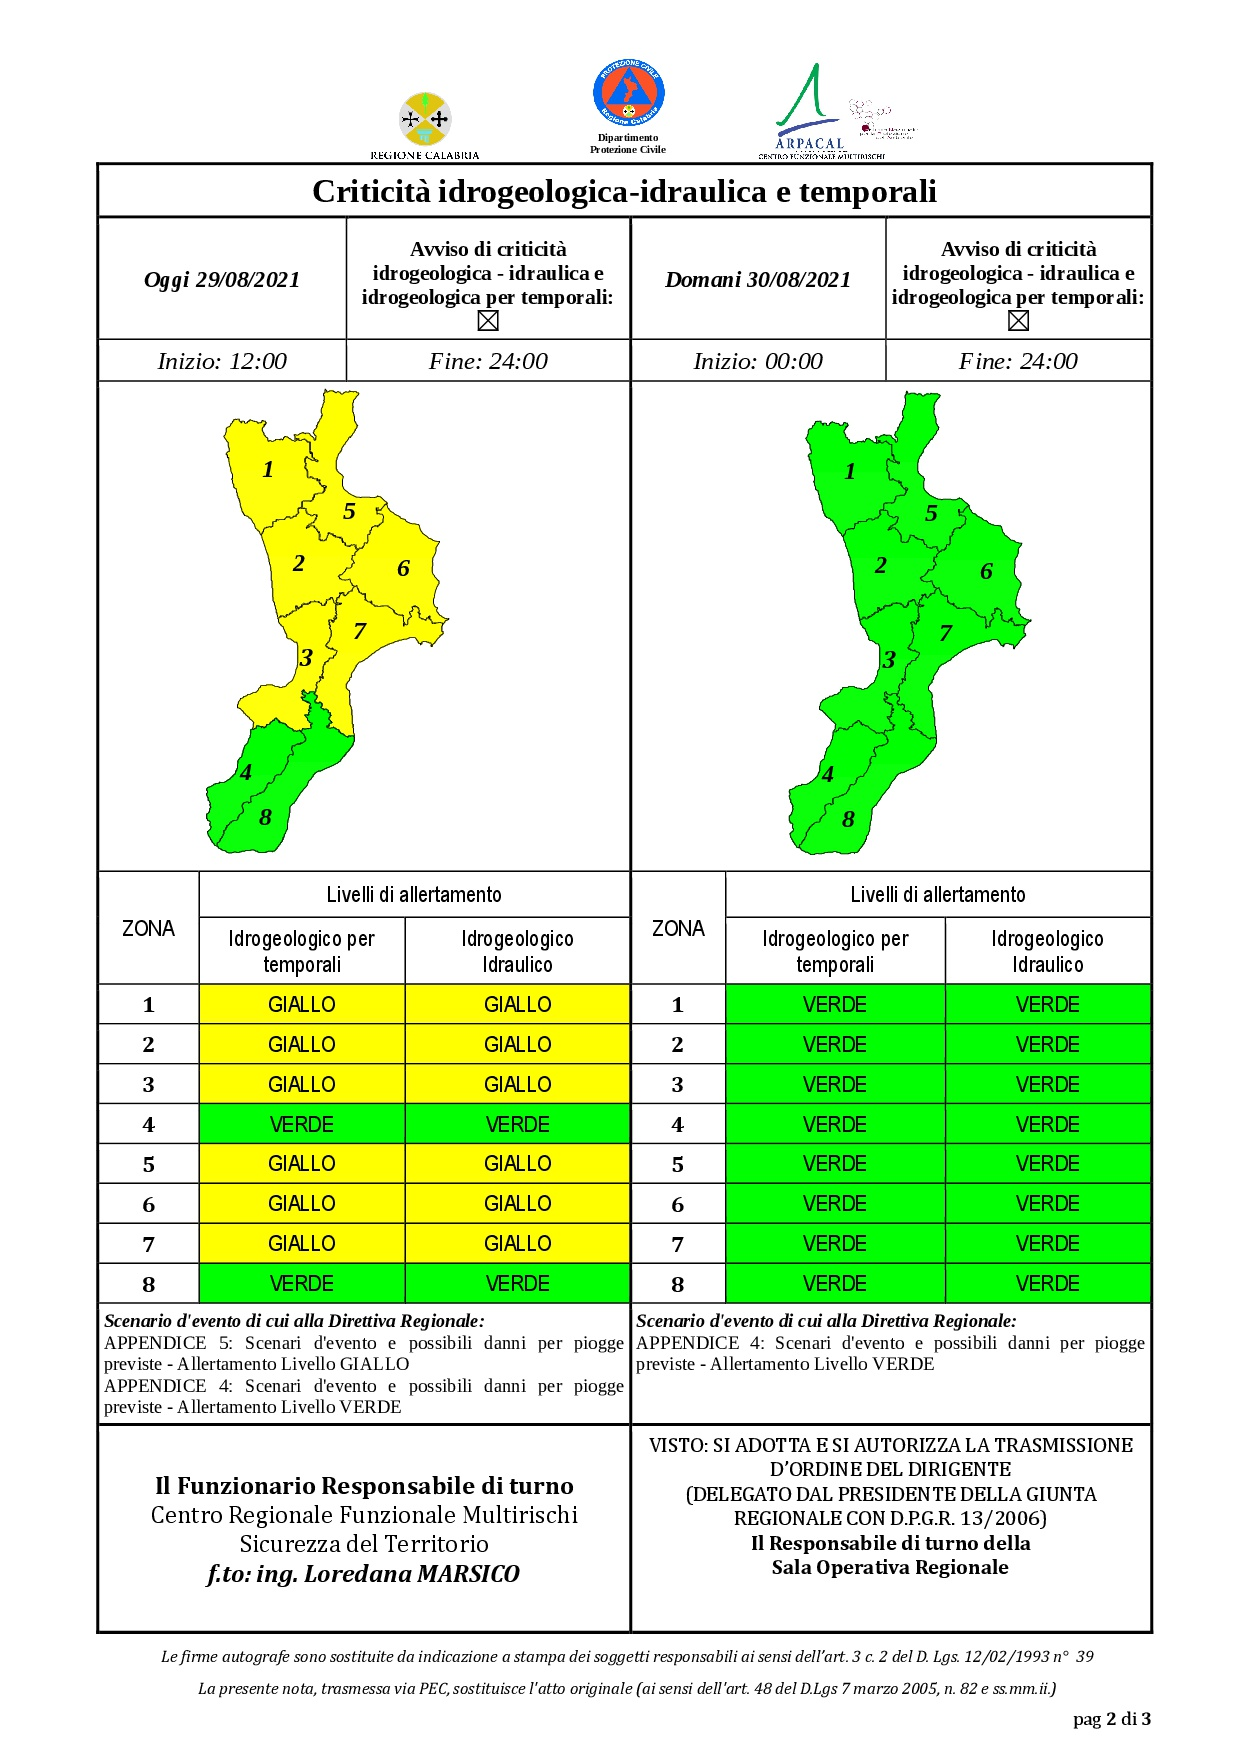 Criticità idrogeologica-idraulica e temporali in Calabria 29-08-2021